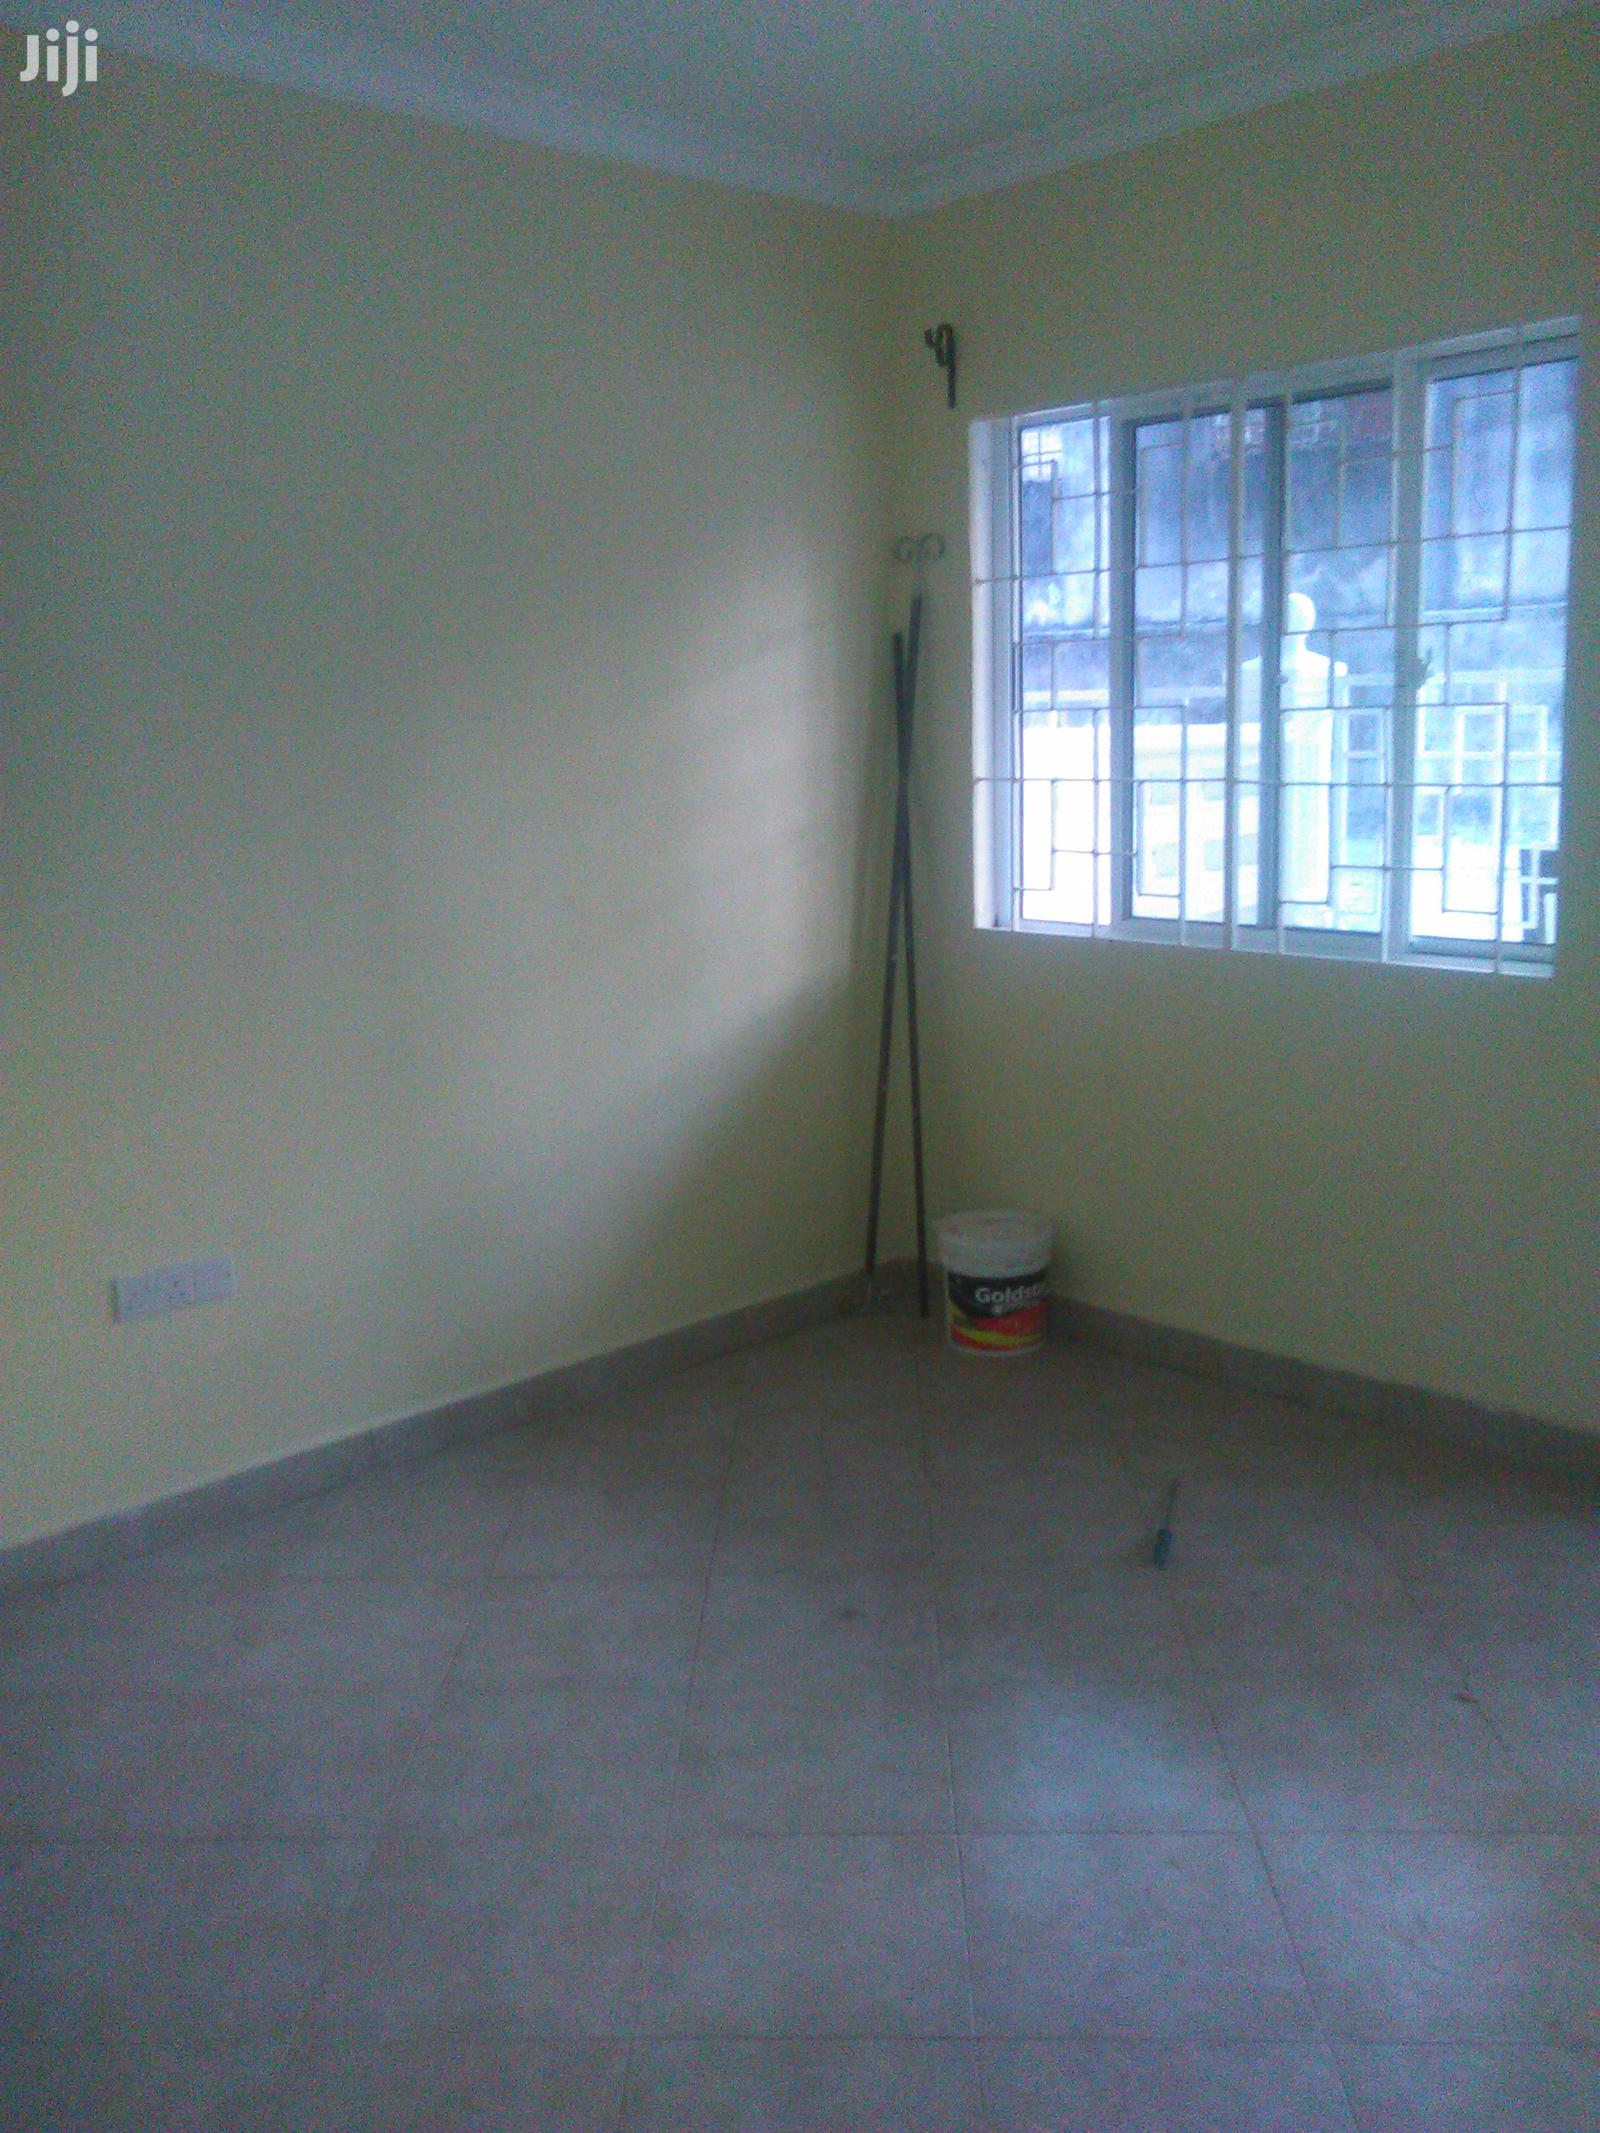 Ina Master,Sebule,Jiko,Choo Na Car Parking   Houses & Apartments For Rent for sale in Kinondoni, Dar es Salaam, Tanzania